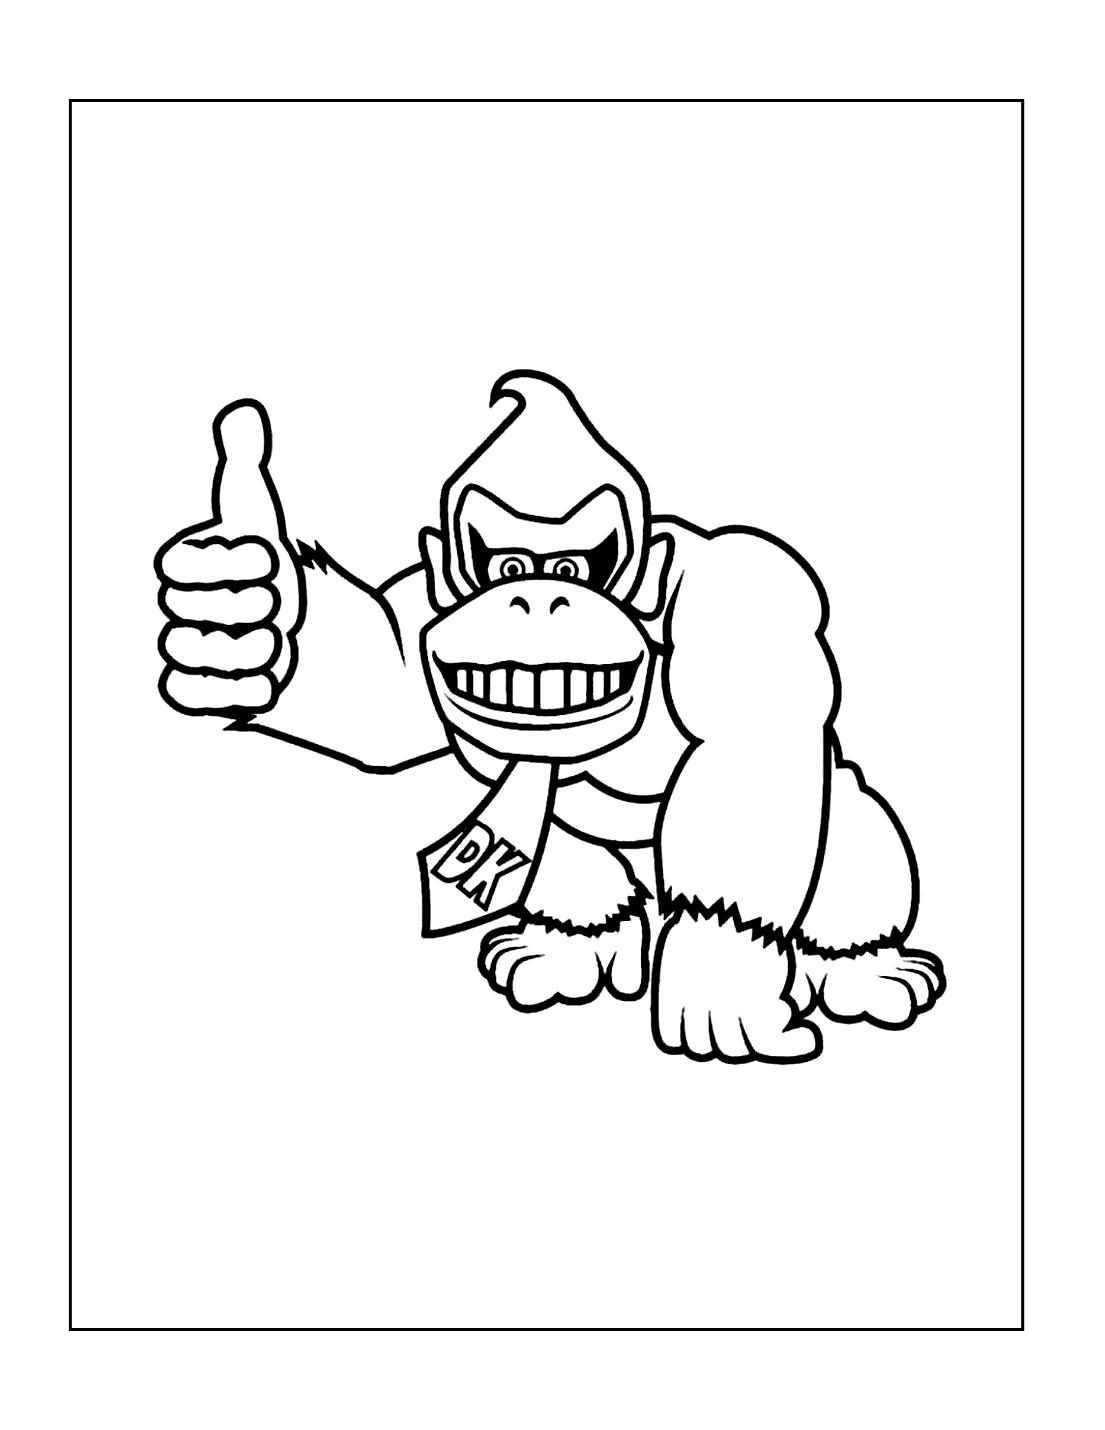 Thumbs Up Donkey Kong Coloring Page